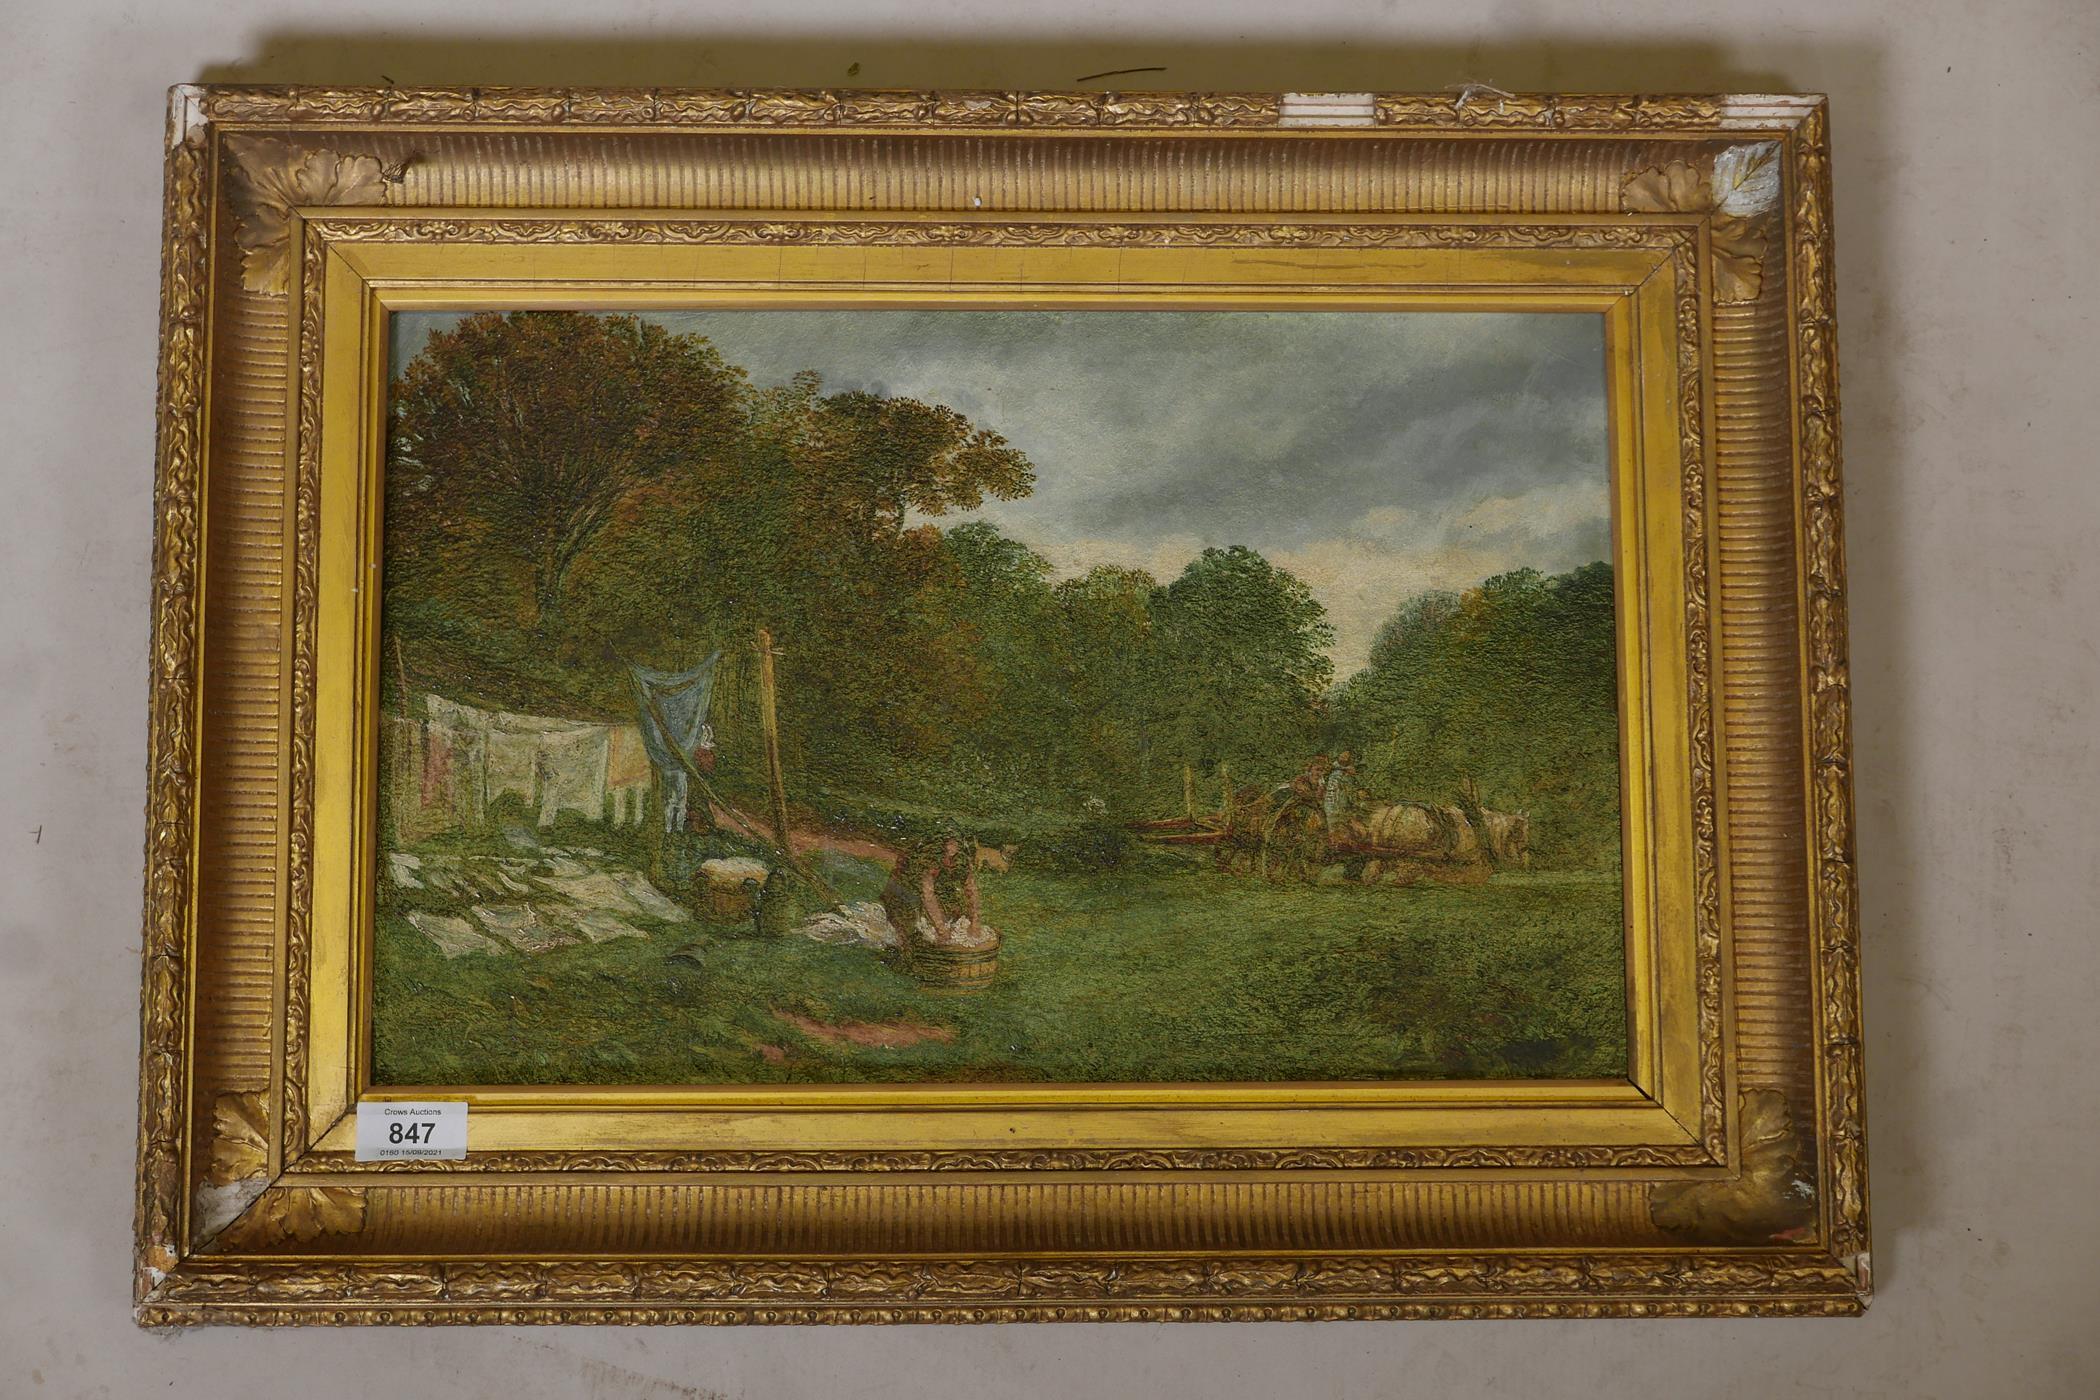 Samuel Bough, landscape with washer women, signed Sam Bough, oil on millboard - Image 2 of 4